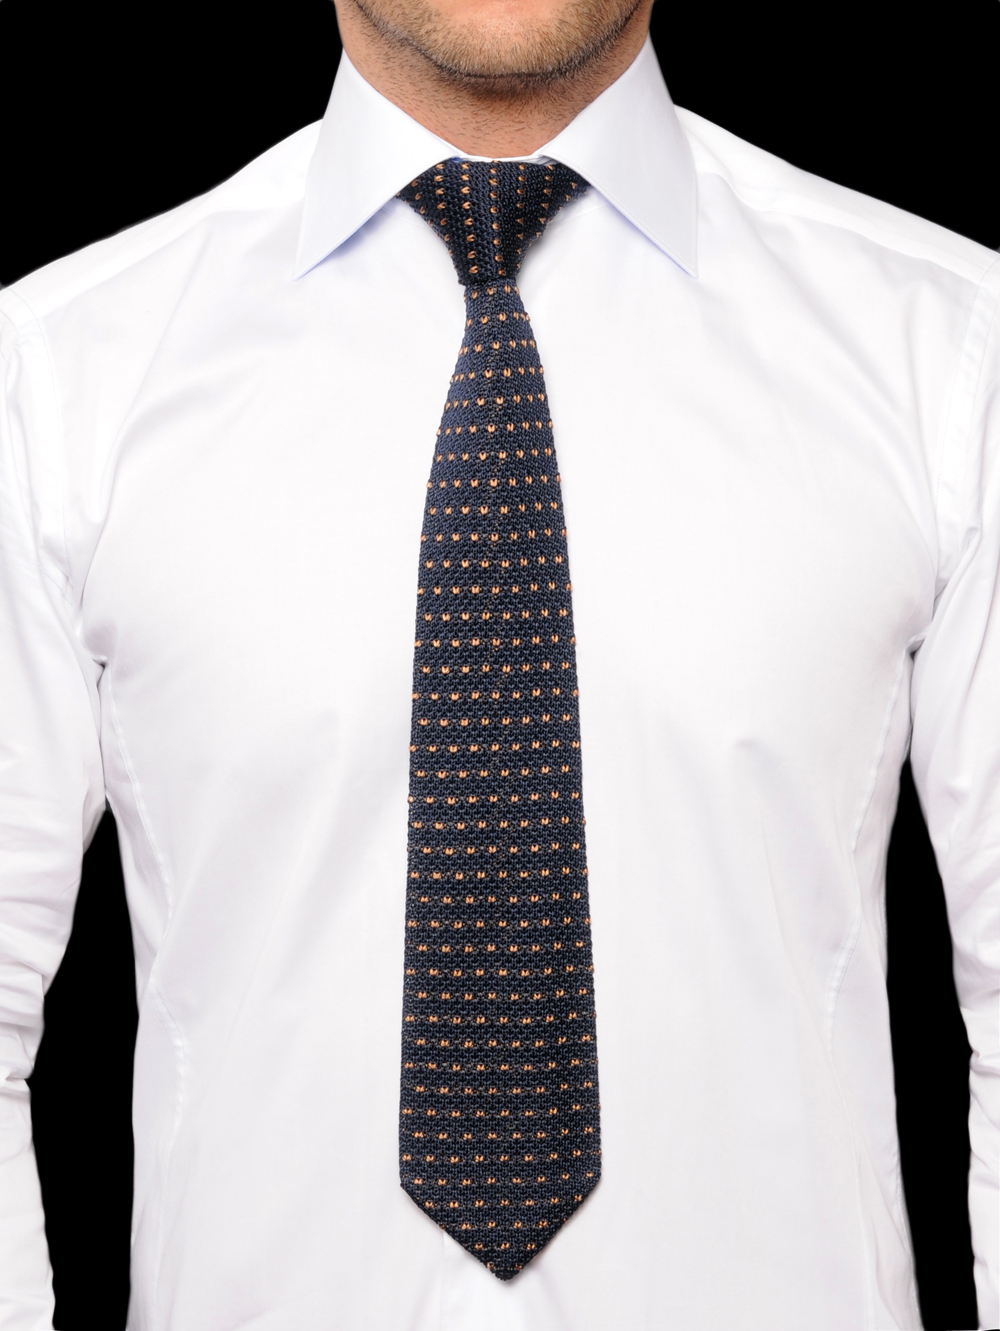 Chemise cravate homme